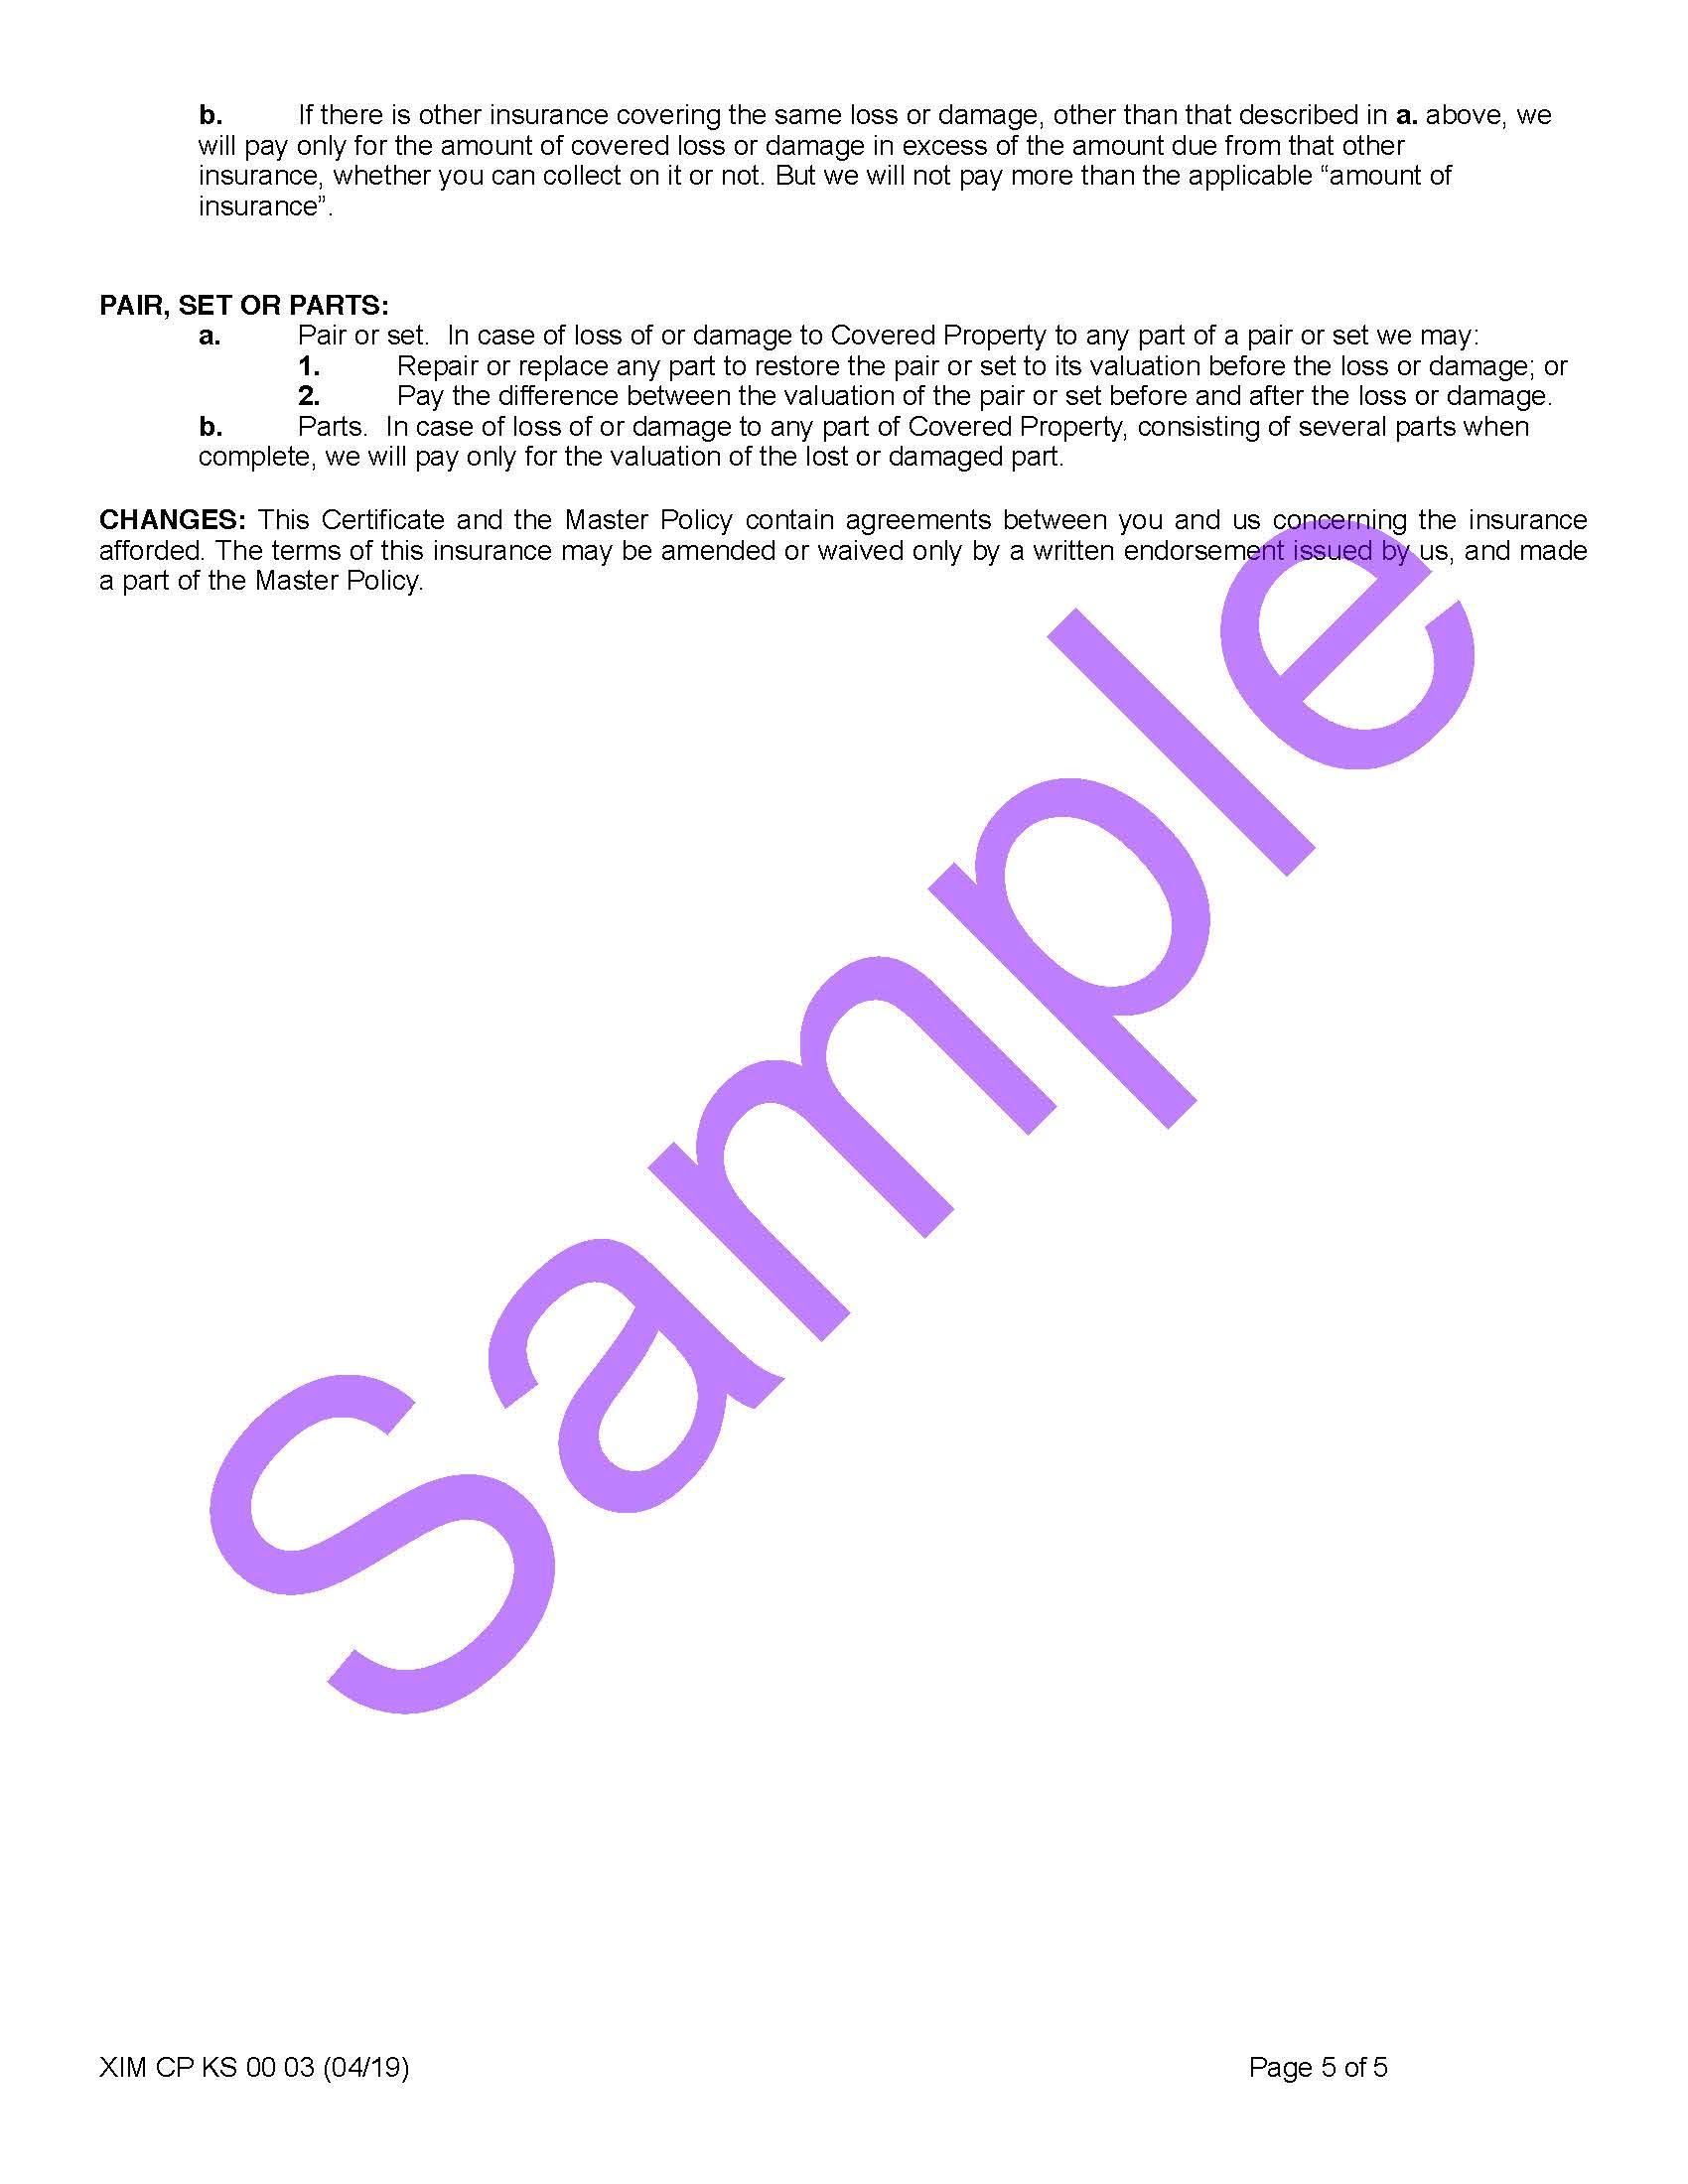 XIM CP KS 00 03 04 19 Kansas Certificate of InsuranceSample_Page_5.jpg